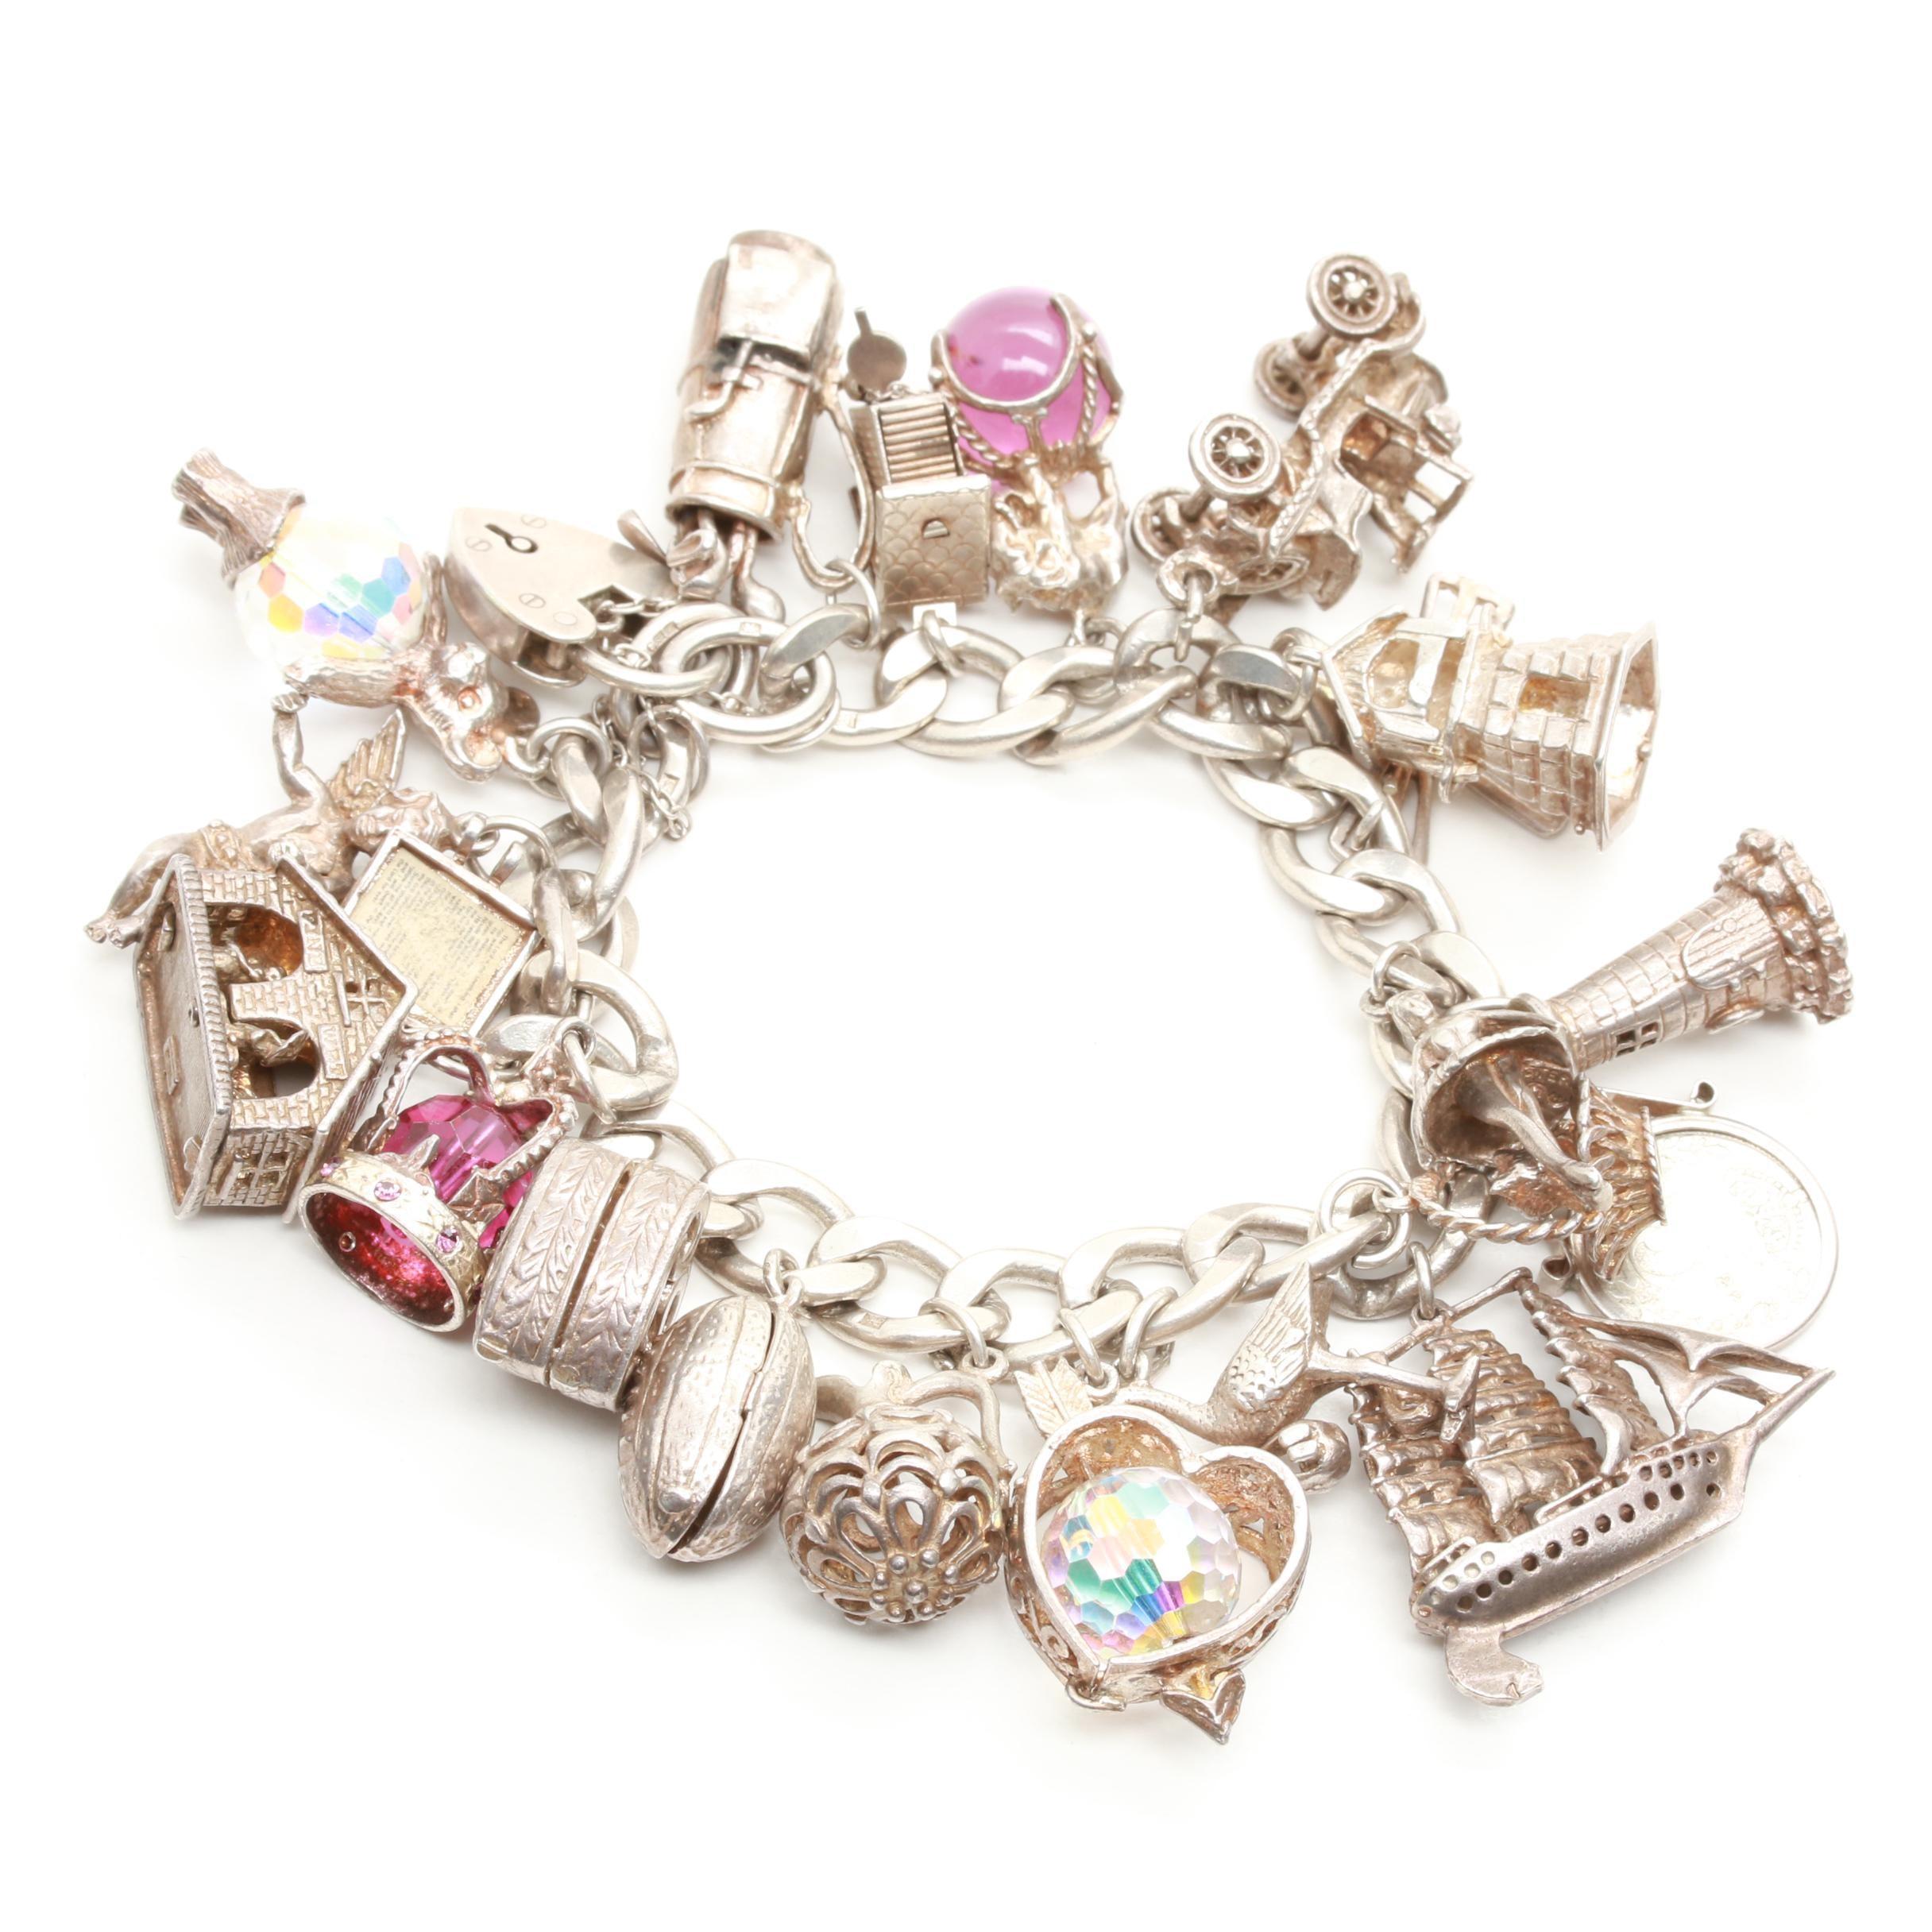 Sterling Silver Charm Bracelet Including Glass